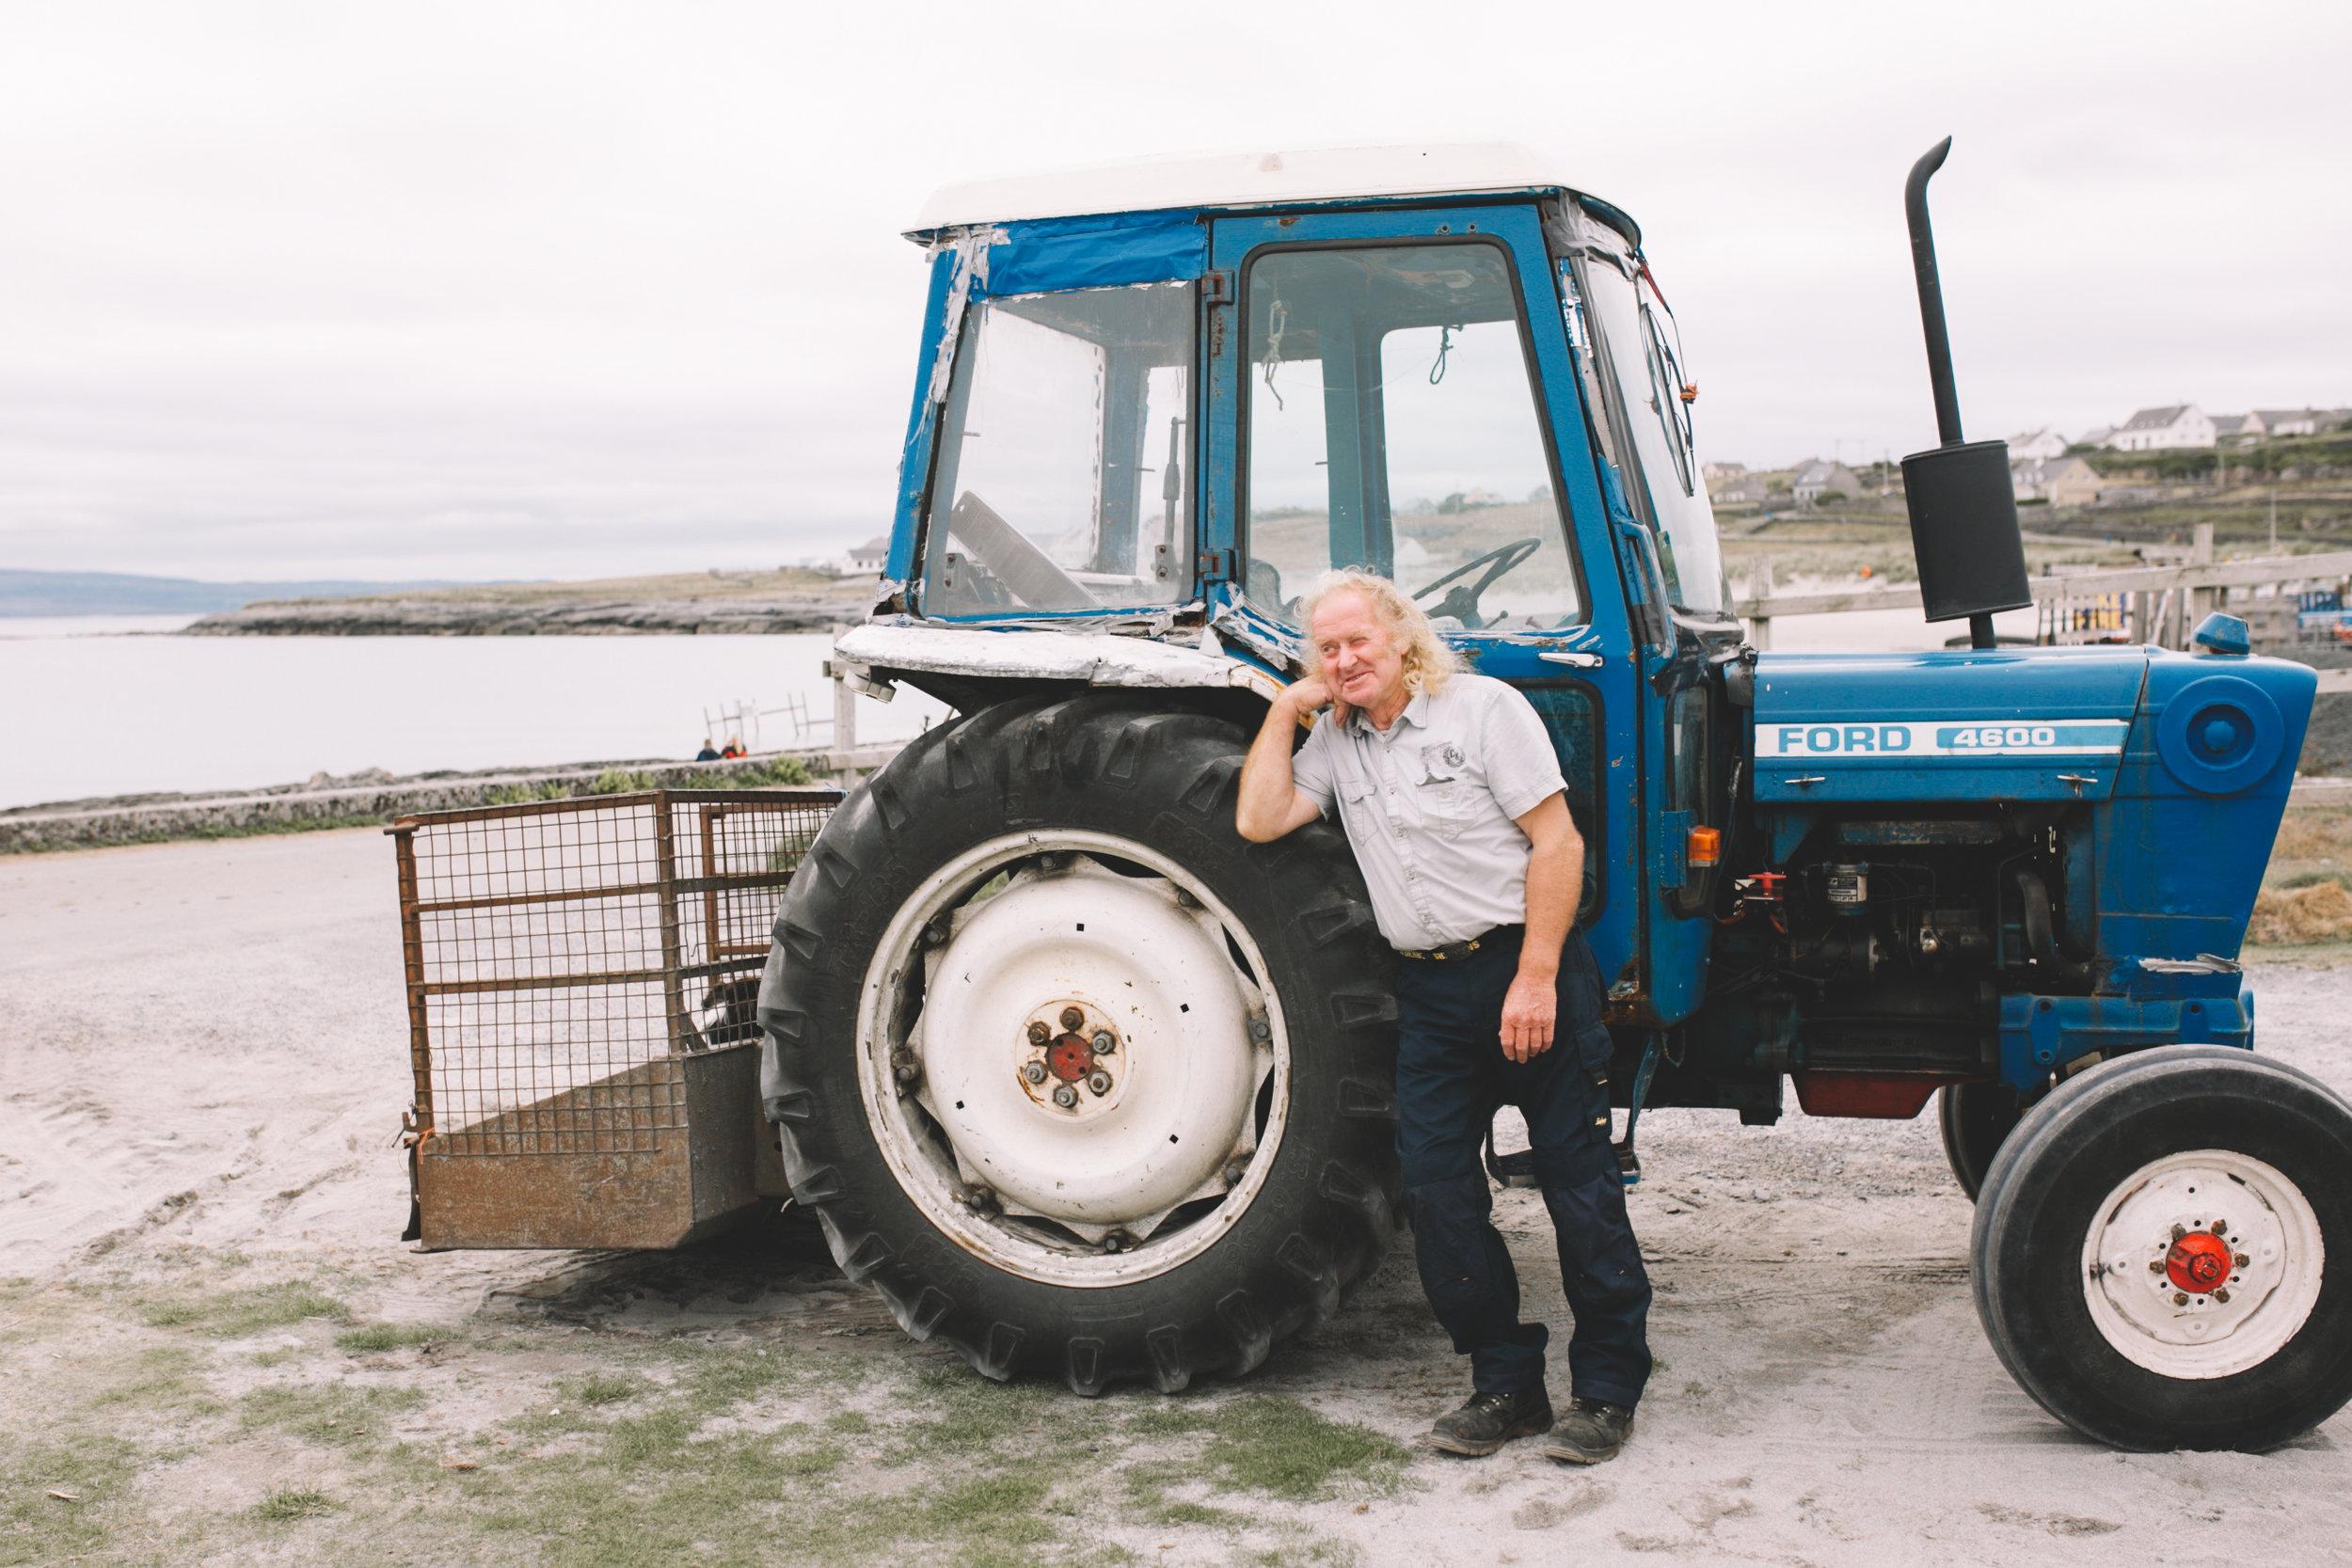 10 Tear Anniversary Trip - Aran Island Inis Orr Cliffs of Moher  (53 of 96).jpg